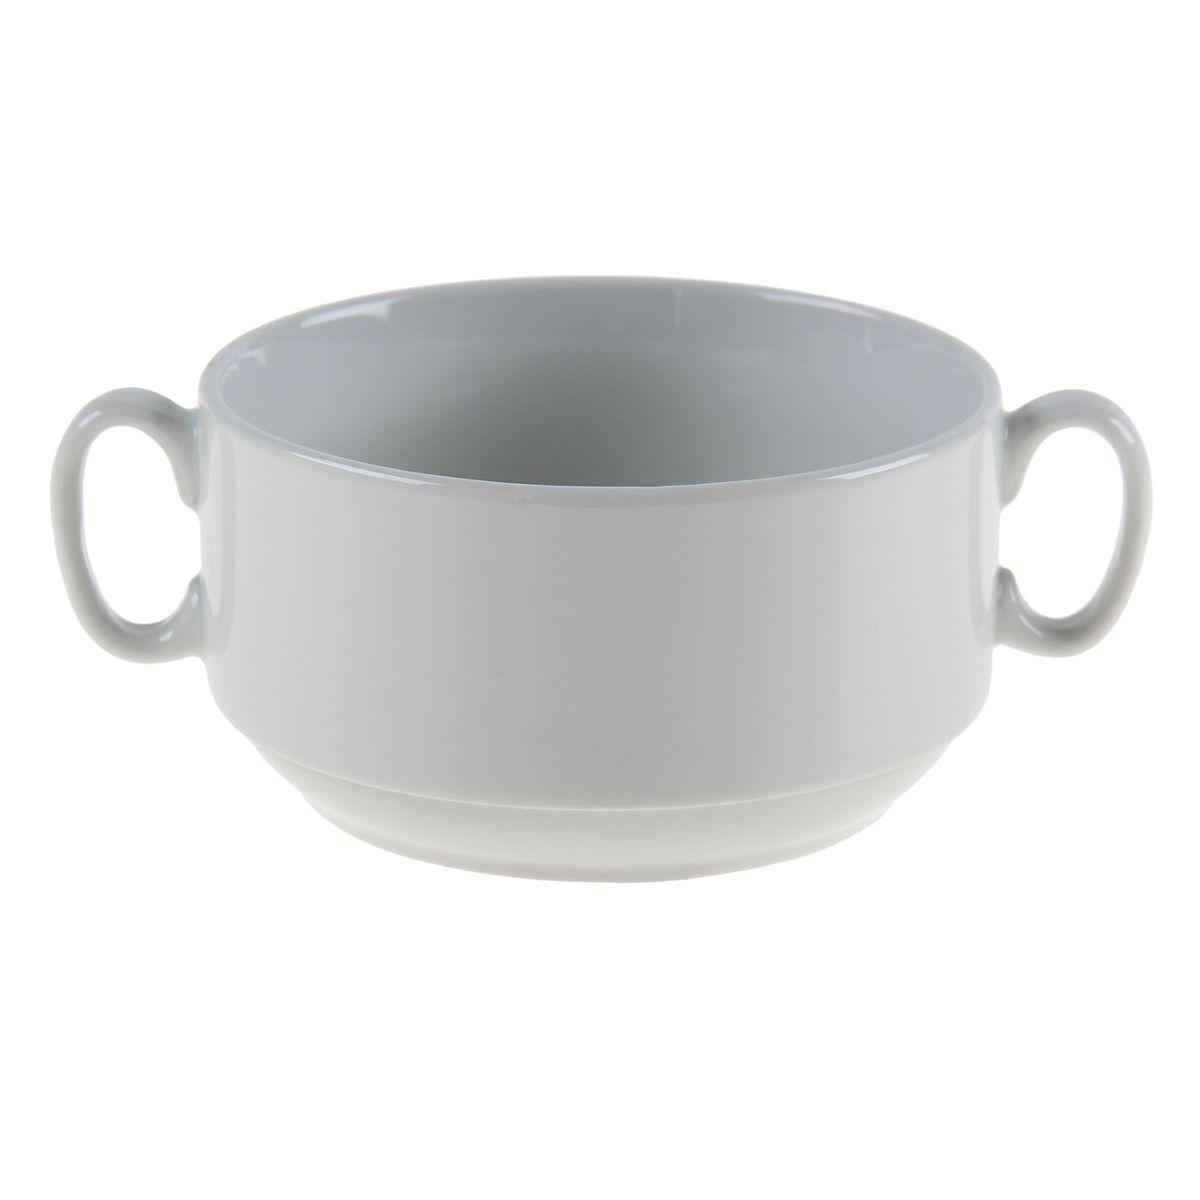 Чашка для бульона Белье, 470 мл. 11095011109501